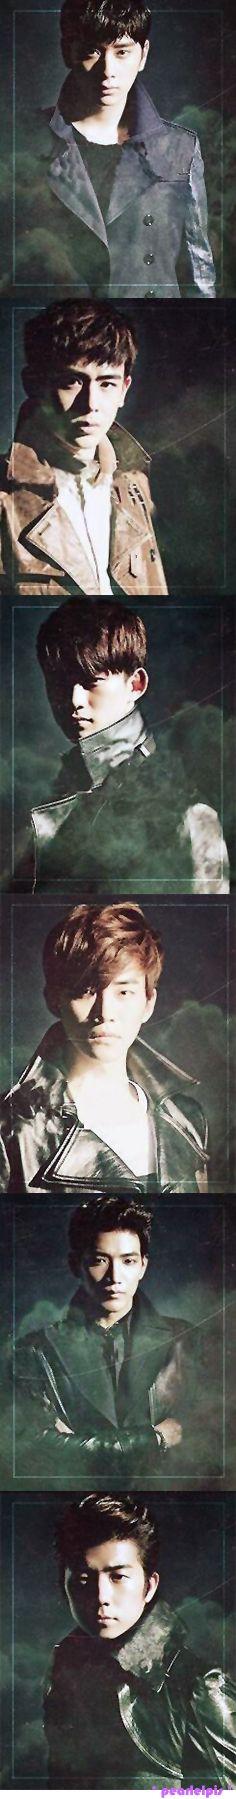 2PM <3 <3